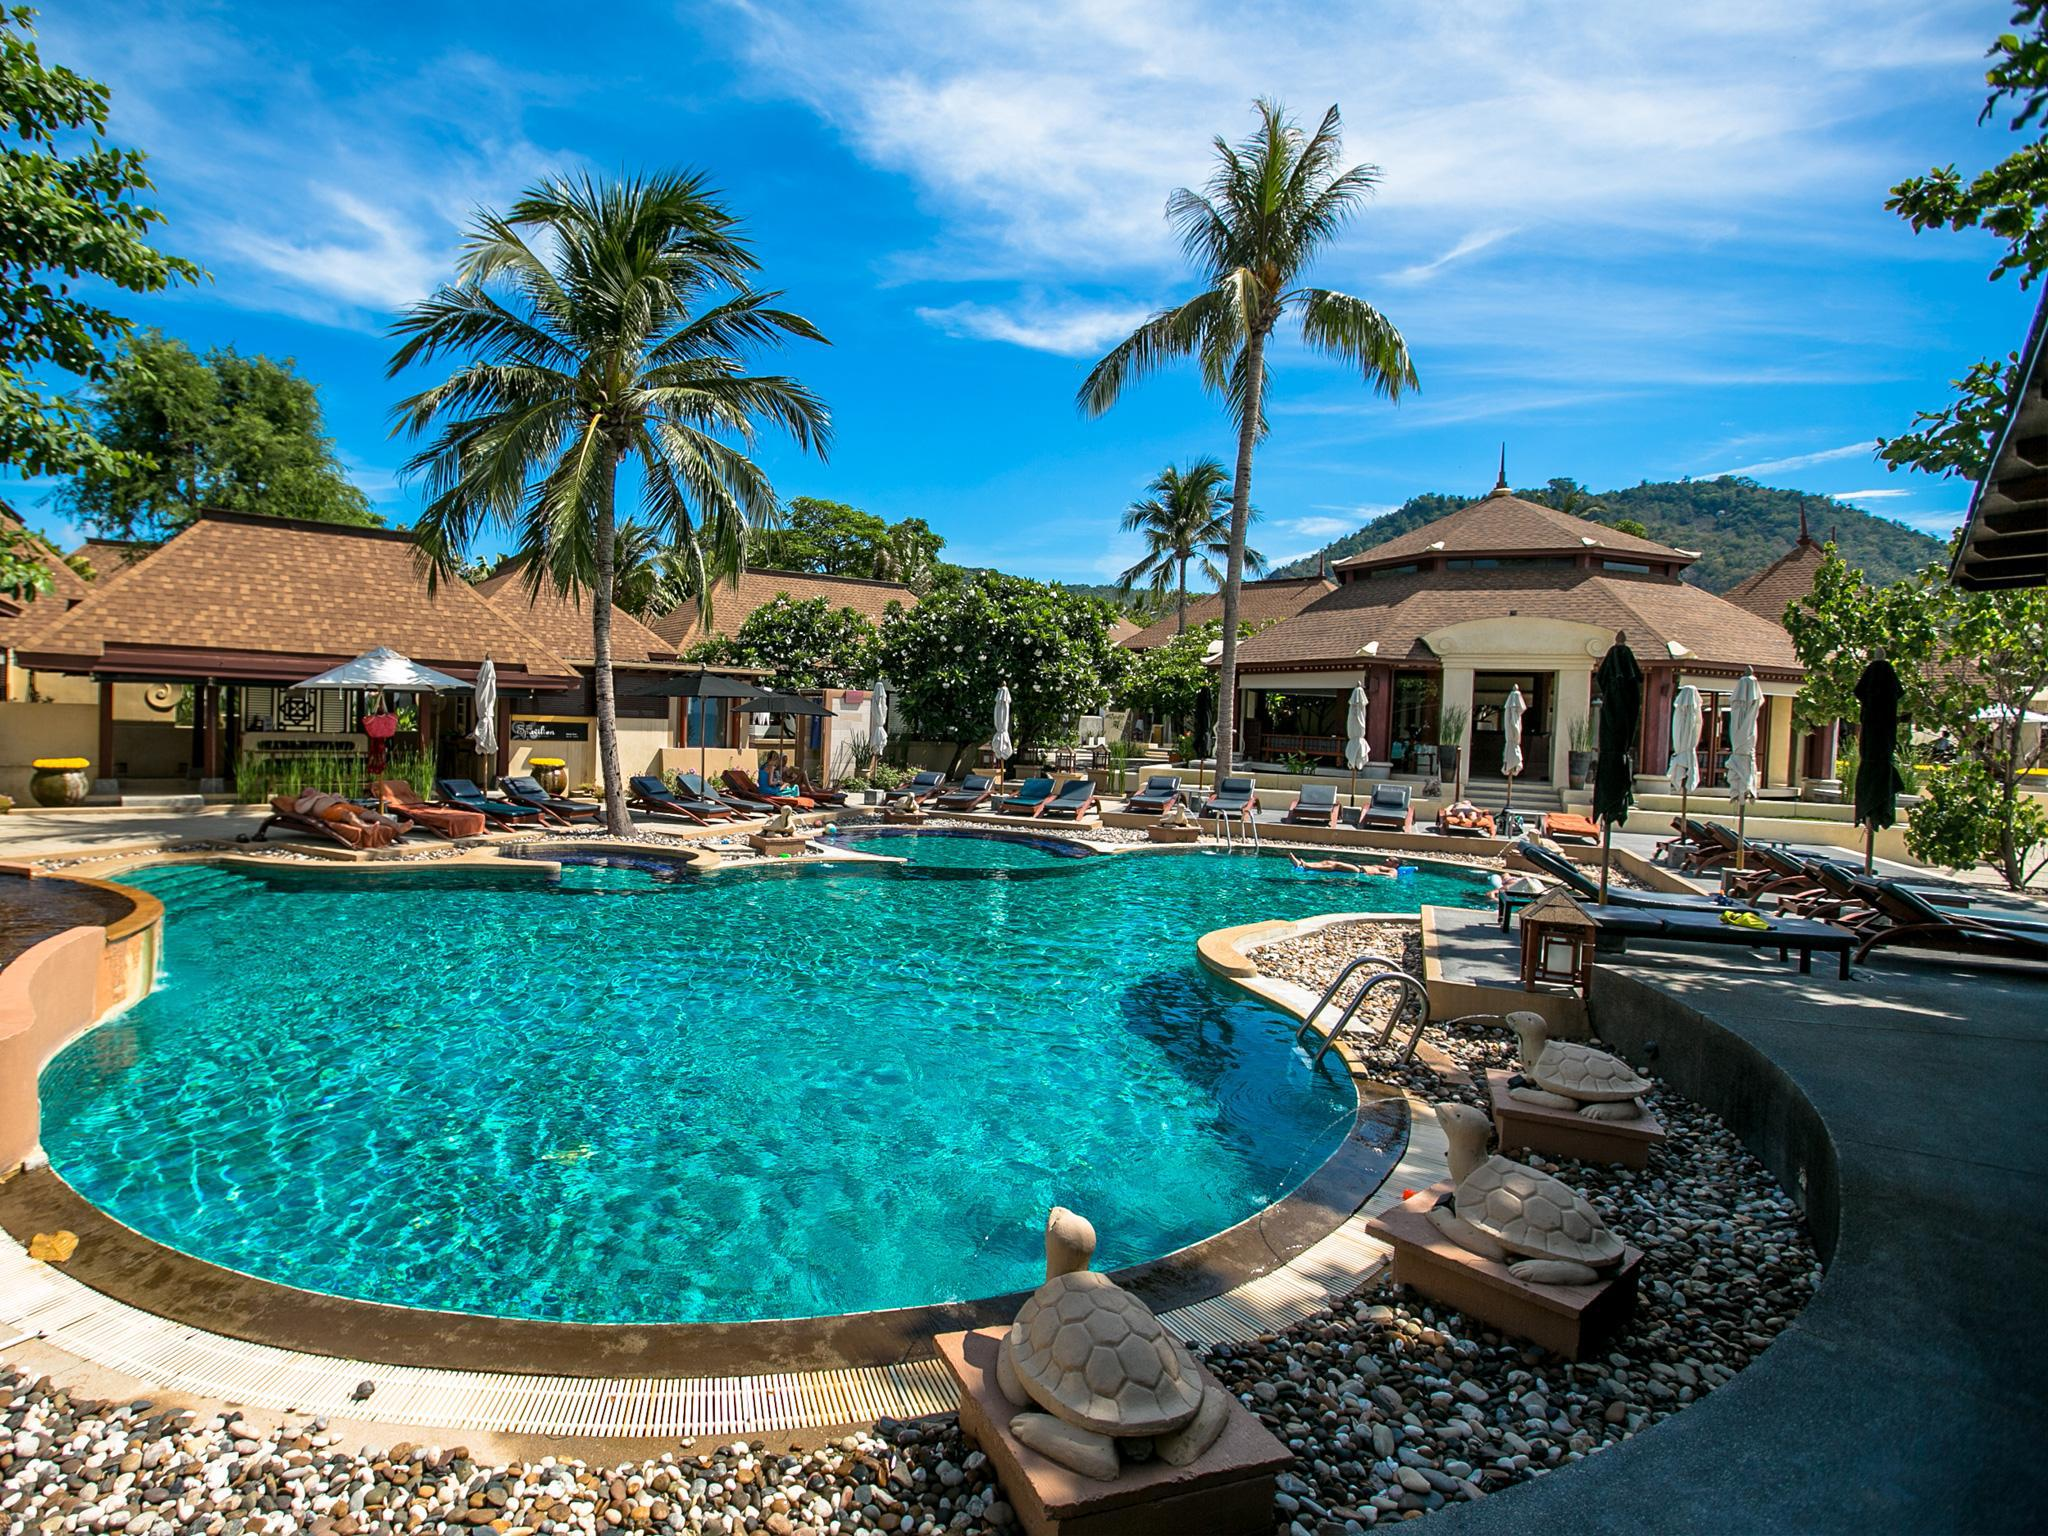 Pavilion Samui Villas & Resort พาวิเลียน สมุย วิลล่าแอนด์รีสอร์ต